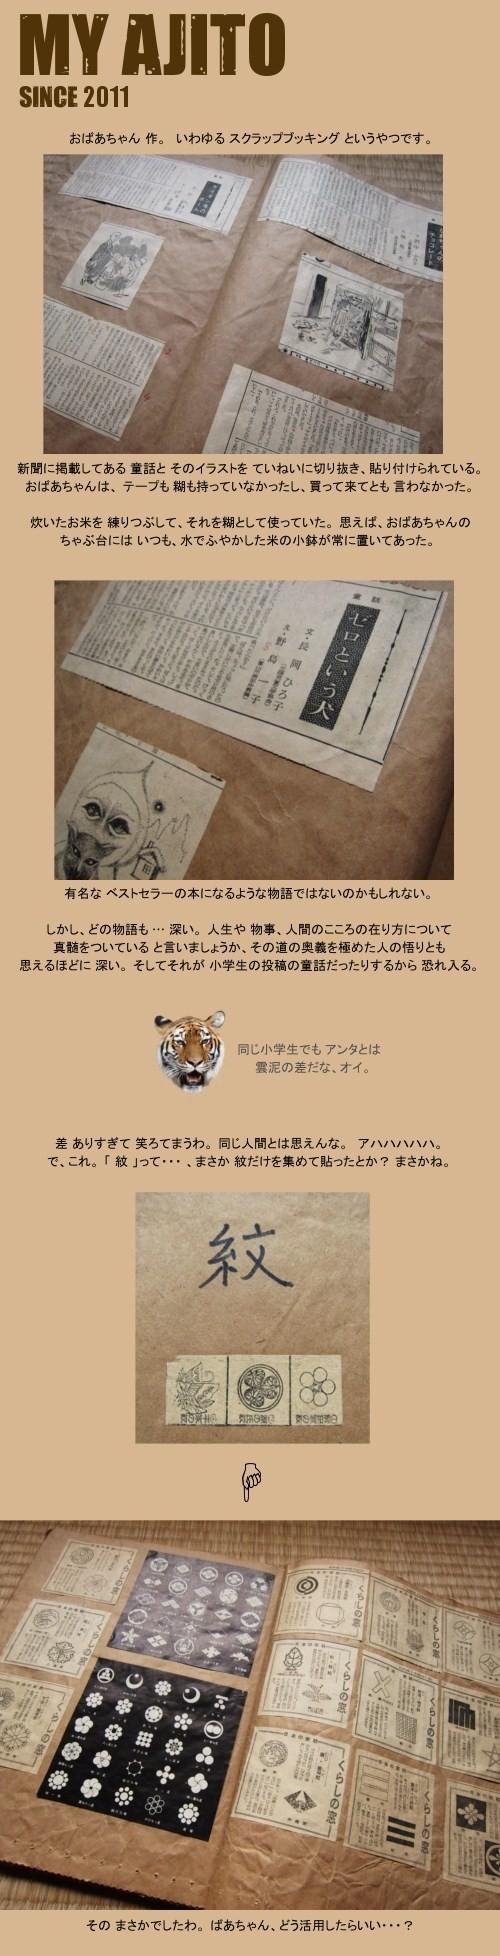 oshiba_4.jpg